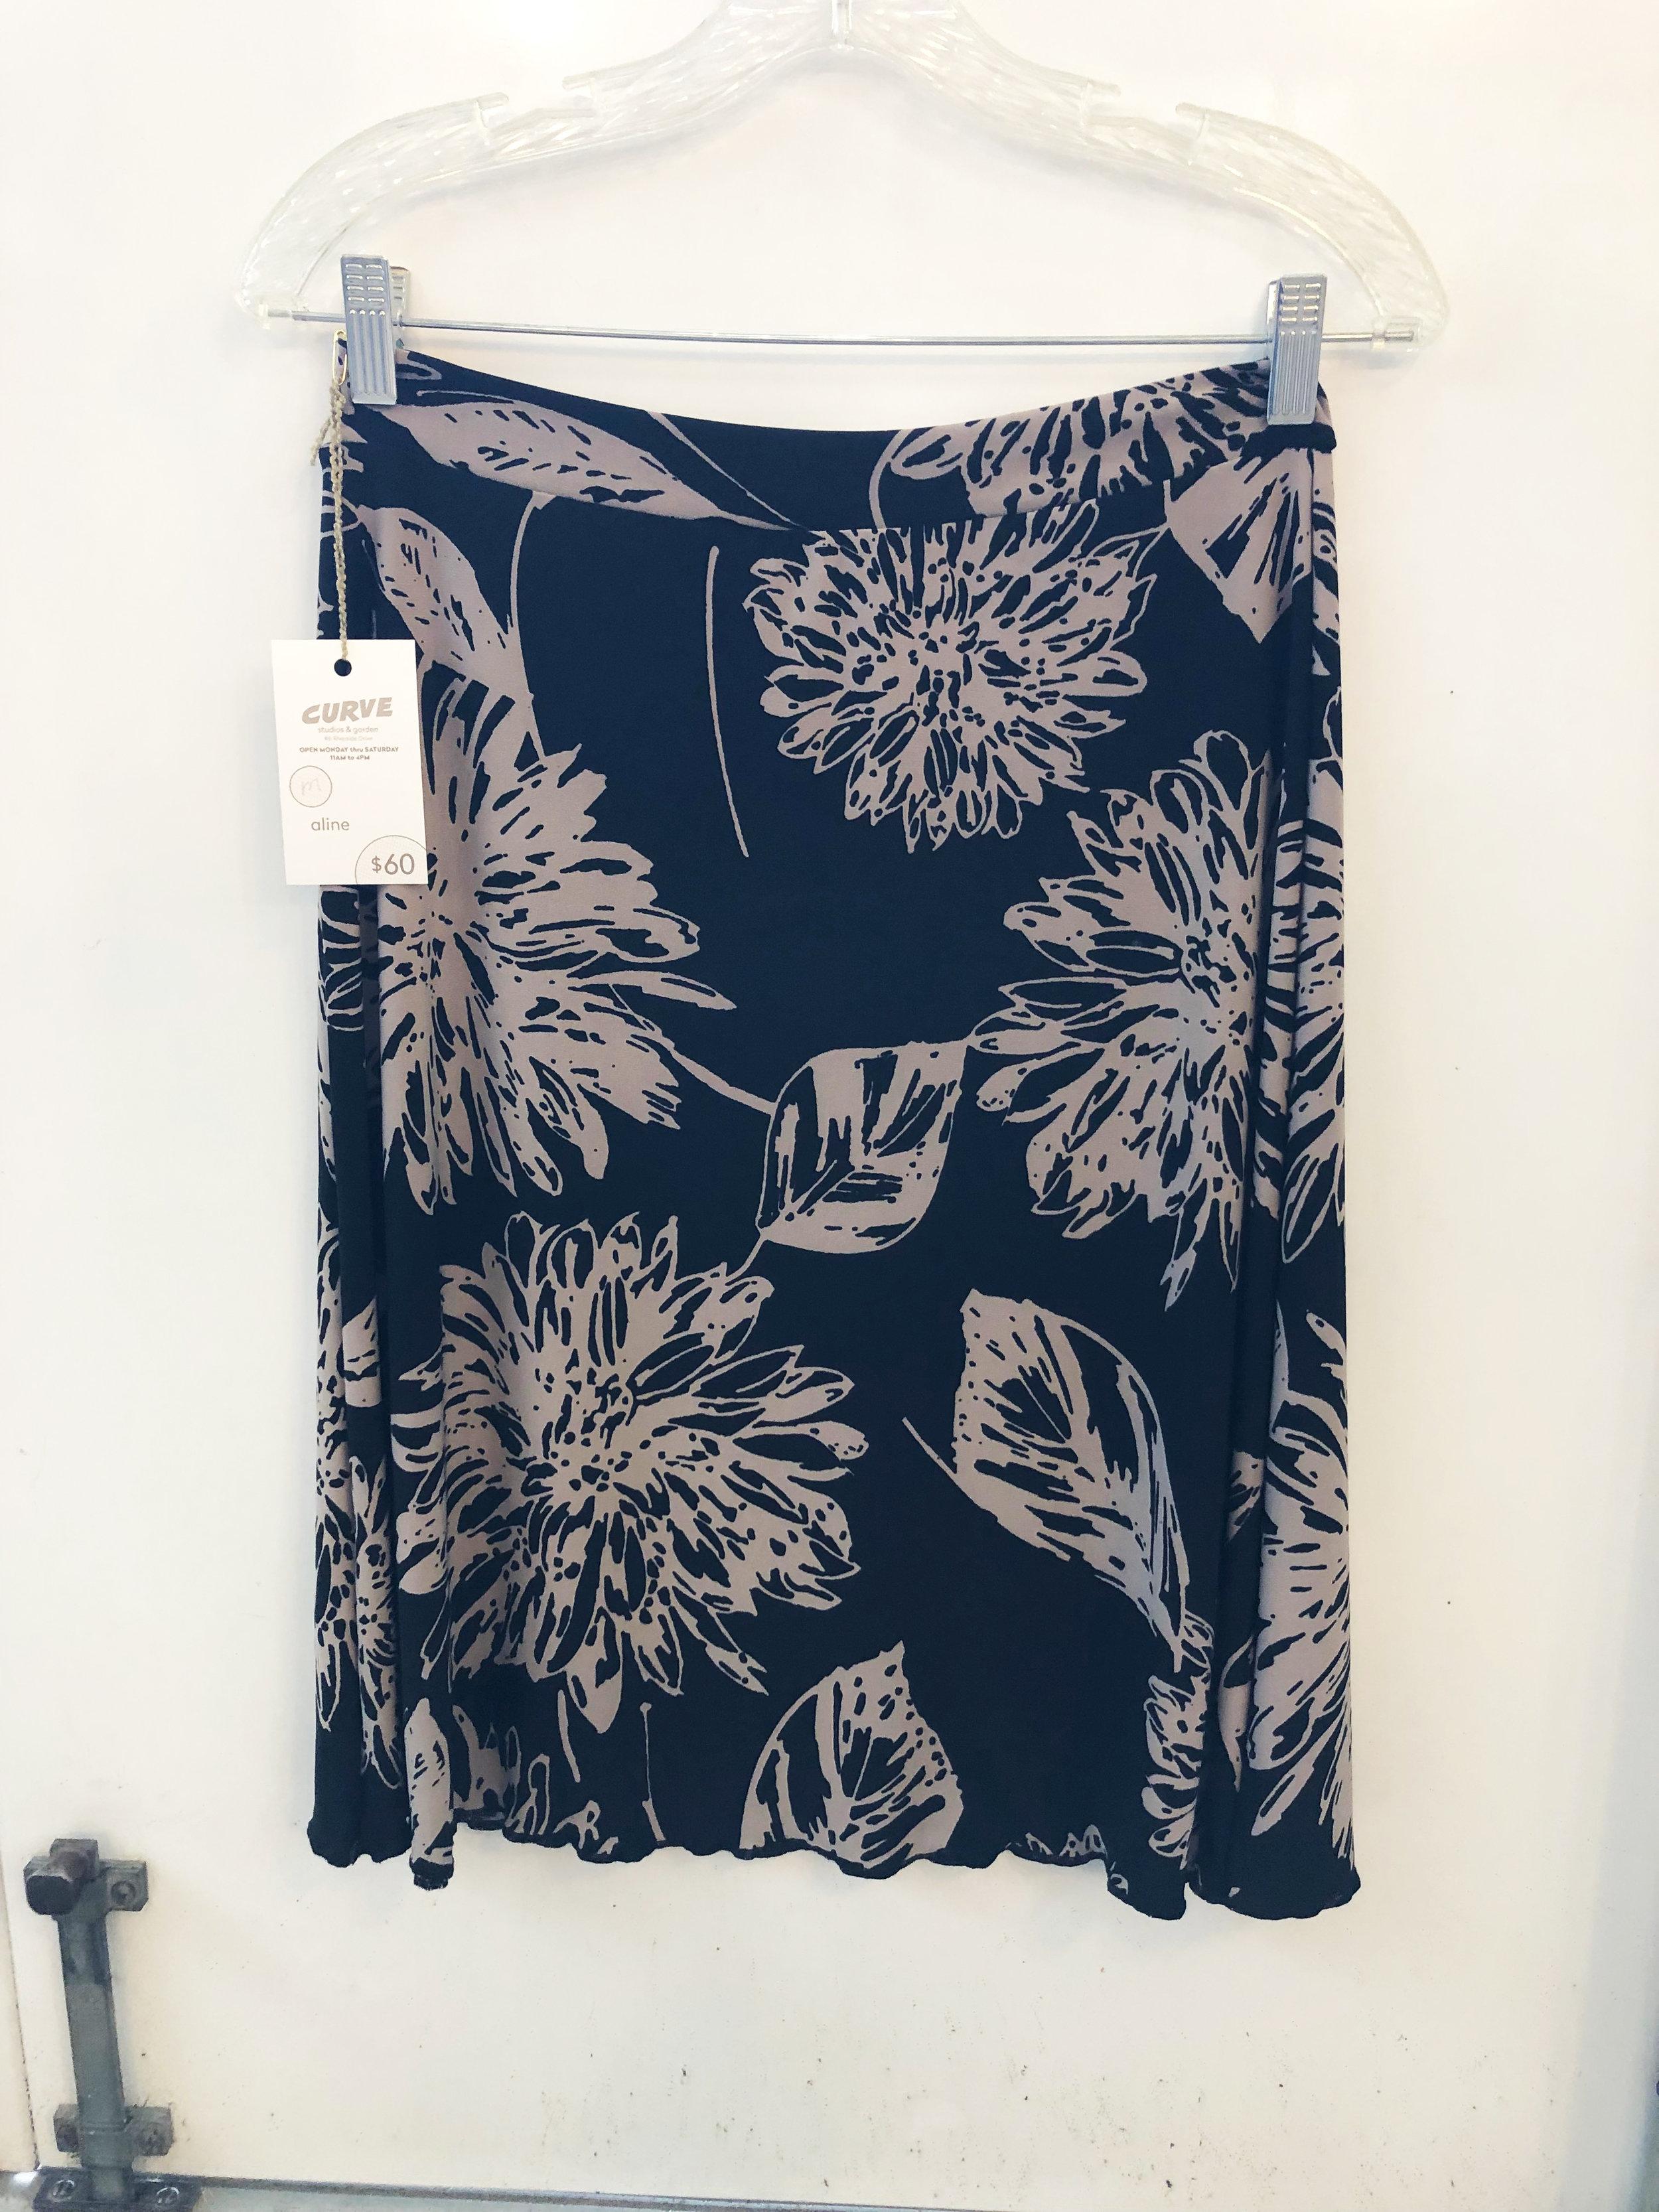 pattiy torno @ CURVE Aline skirt balck tan chrysanthemum ity 2019.jpg